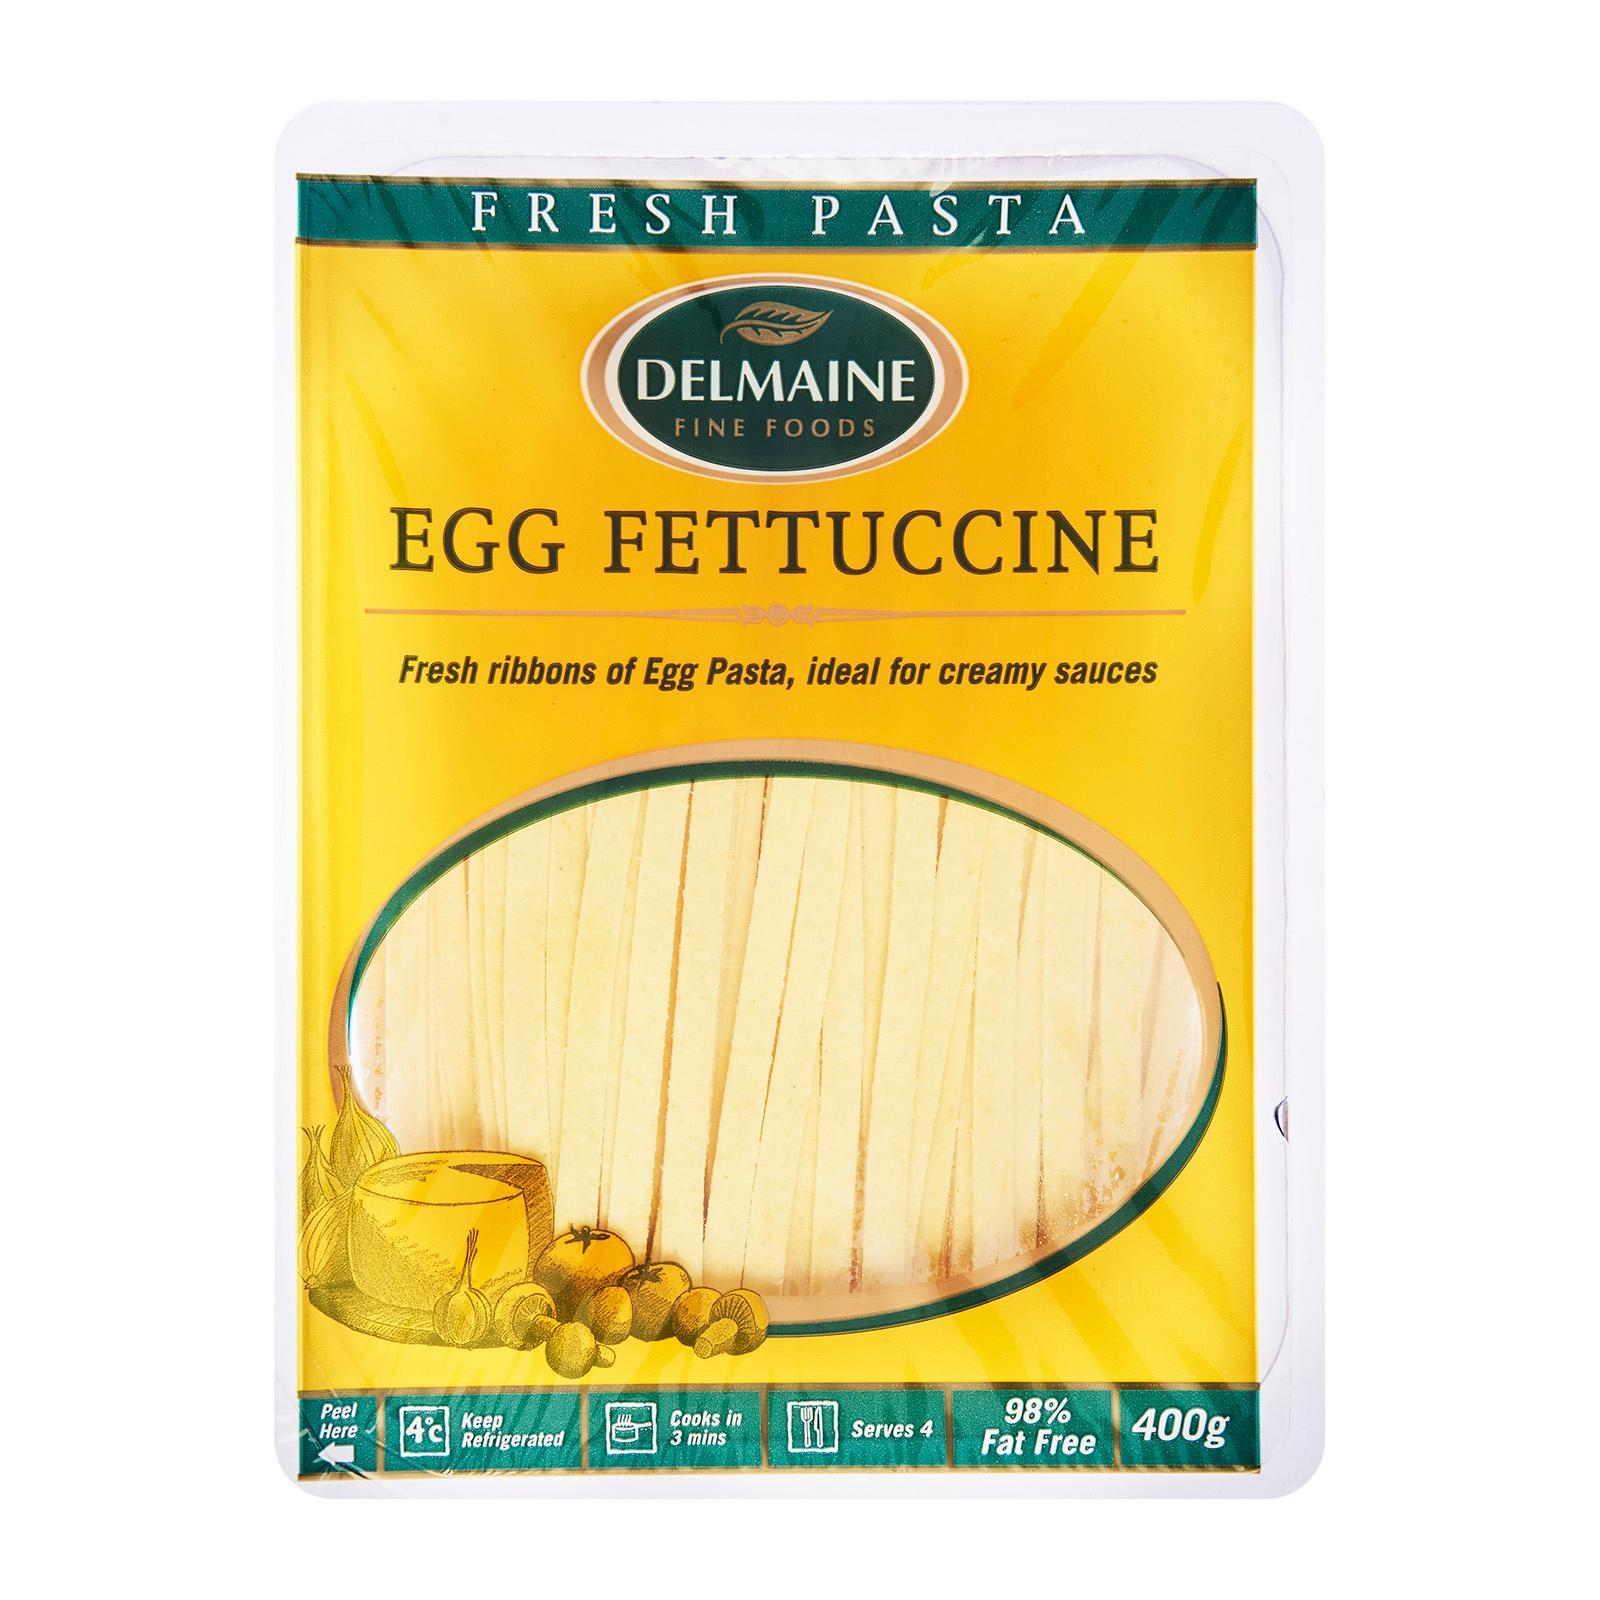 Delmaine Egg Fettuccine Flat Pasta By Redmart.